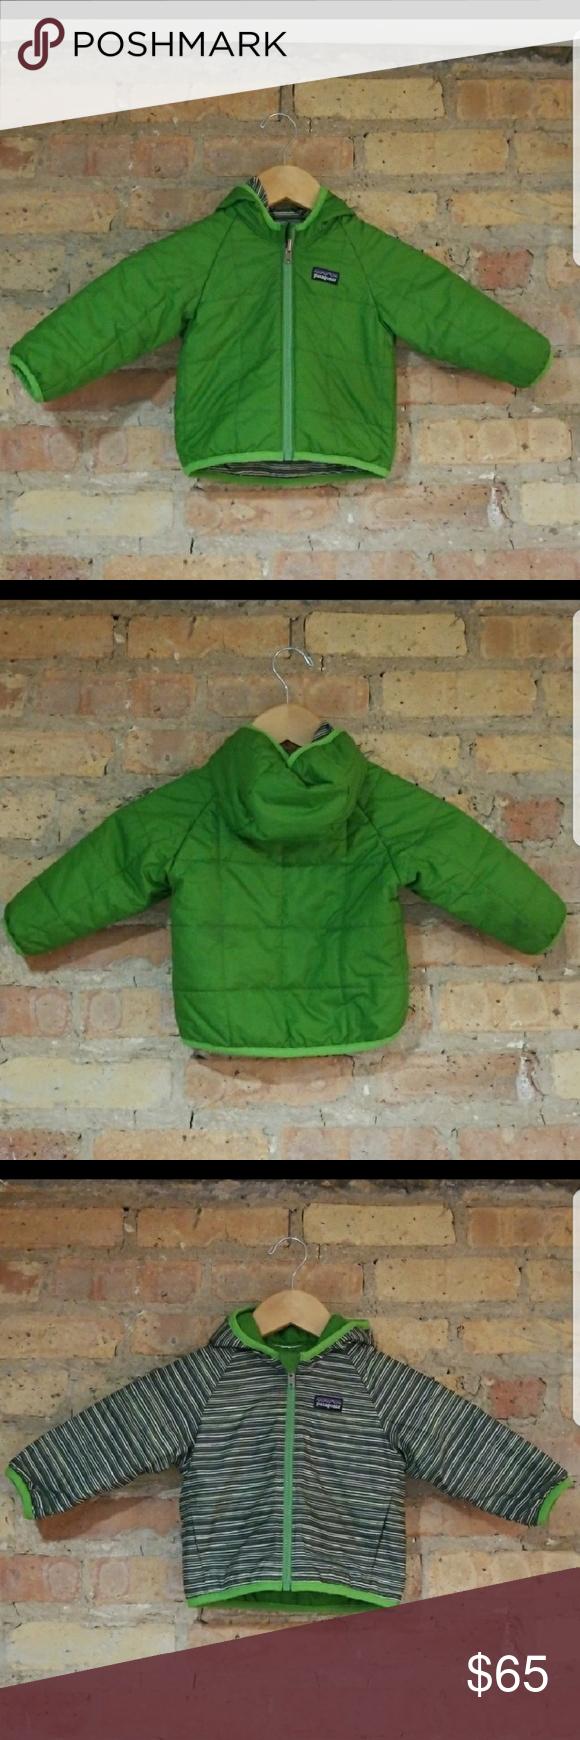 fdc66bf35 Patagonia Baby Reversible Puff-Ball Jacket